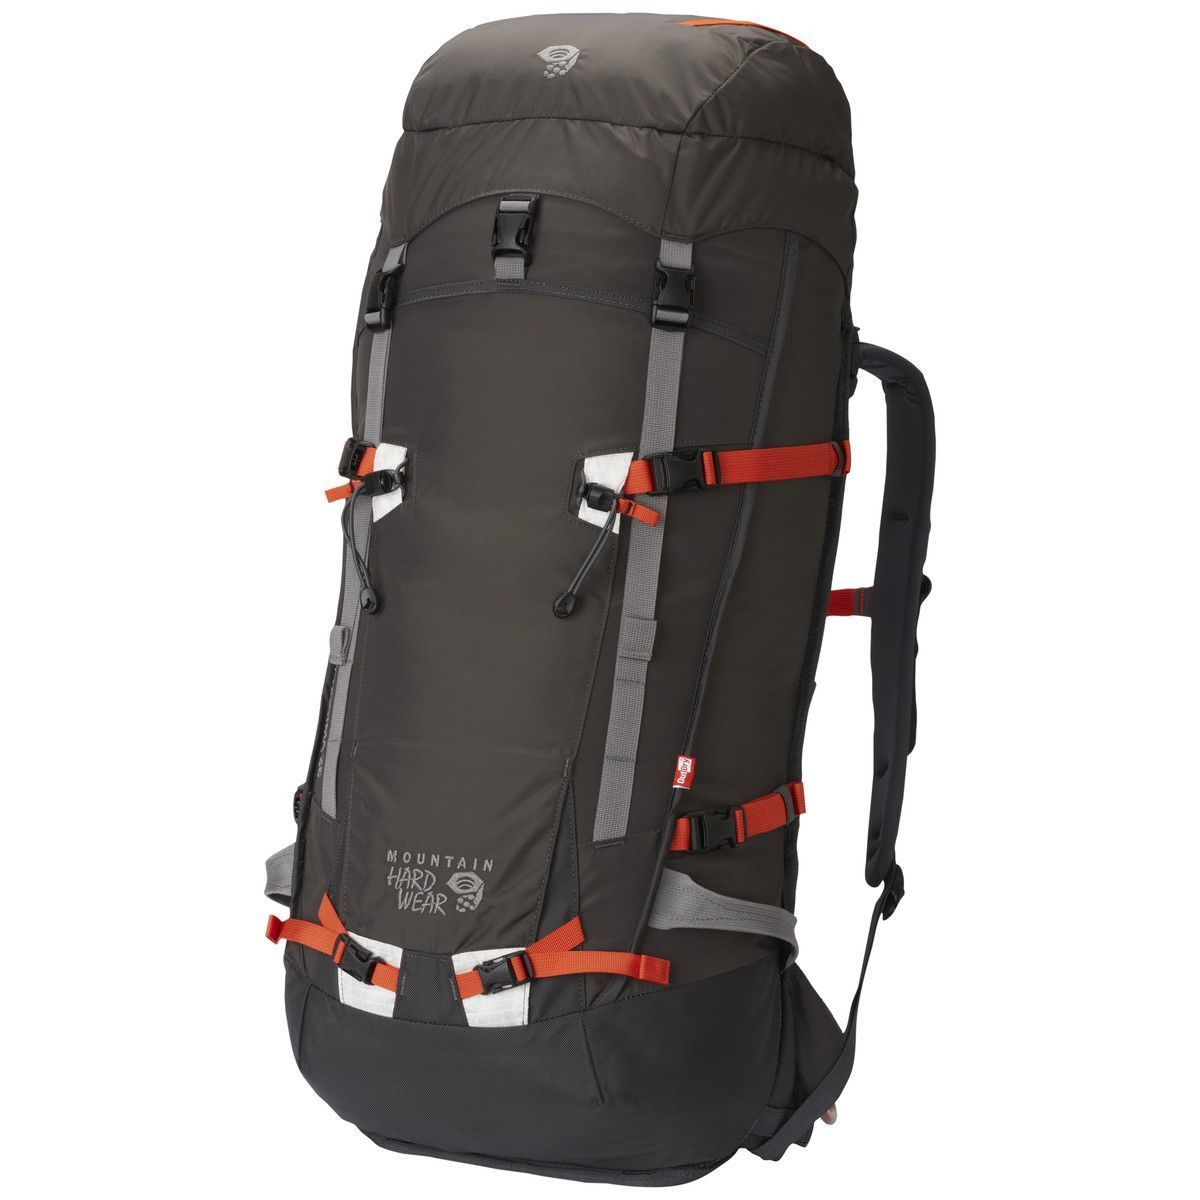 Mountain Hardwear Direttissima 35